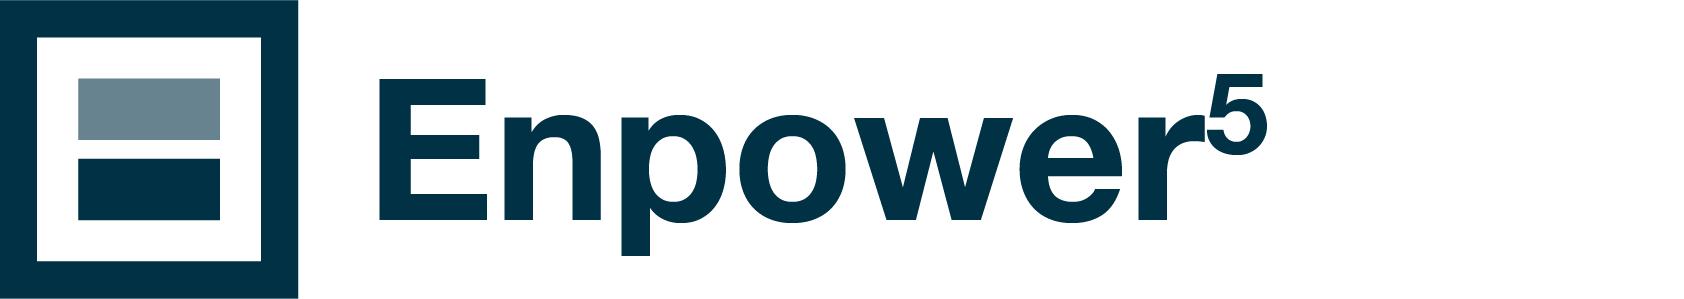 EnPower-logo.png